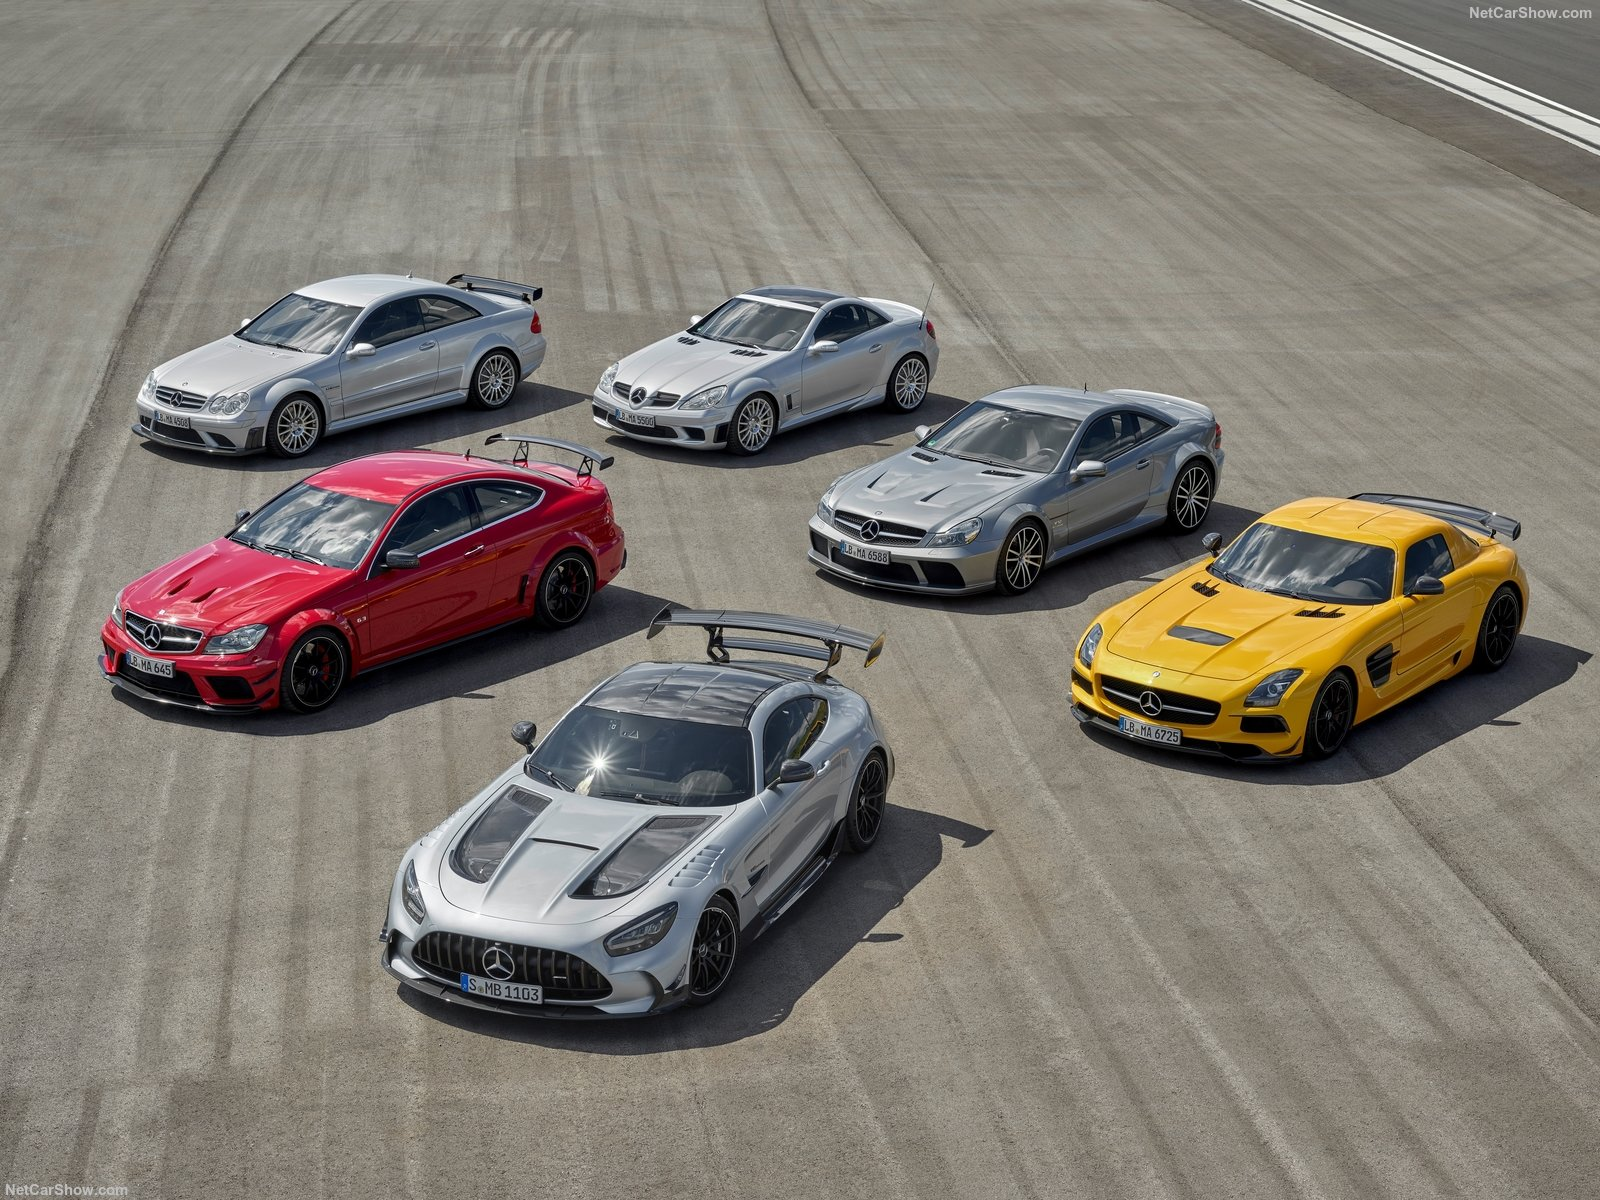 All Mercedes AMG Black Series family